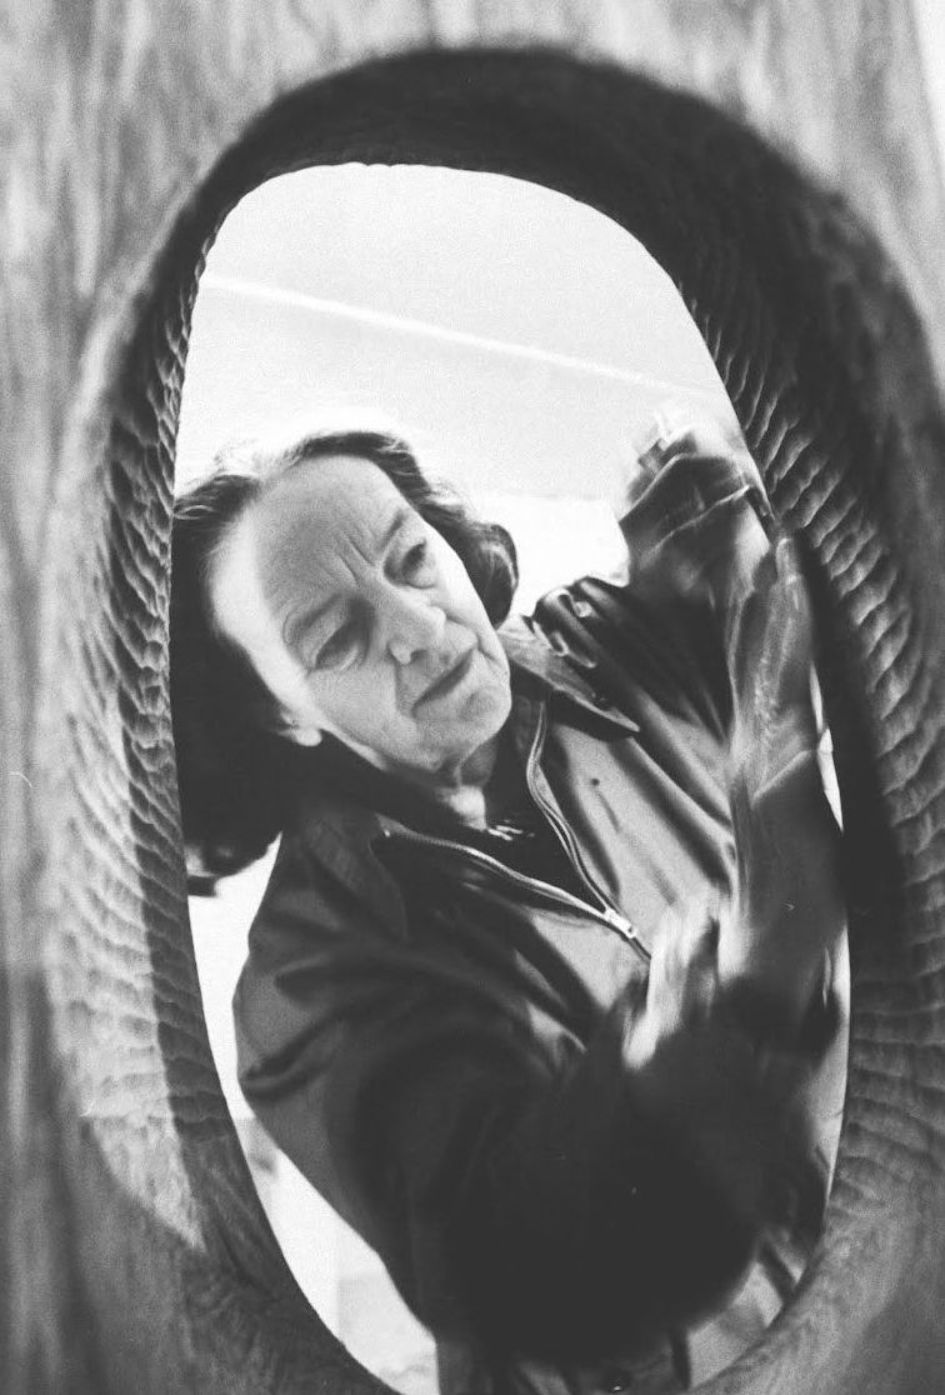 English Sculptor Barbara Hepworth making walnut carving in her studio